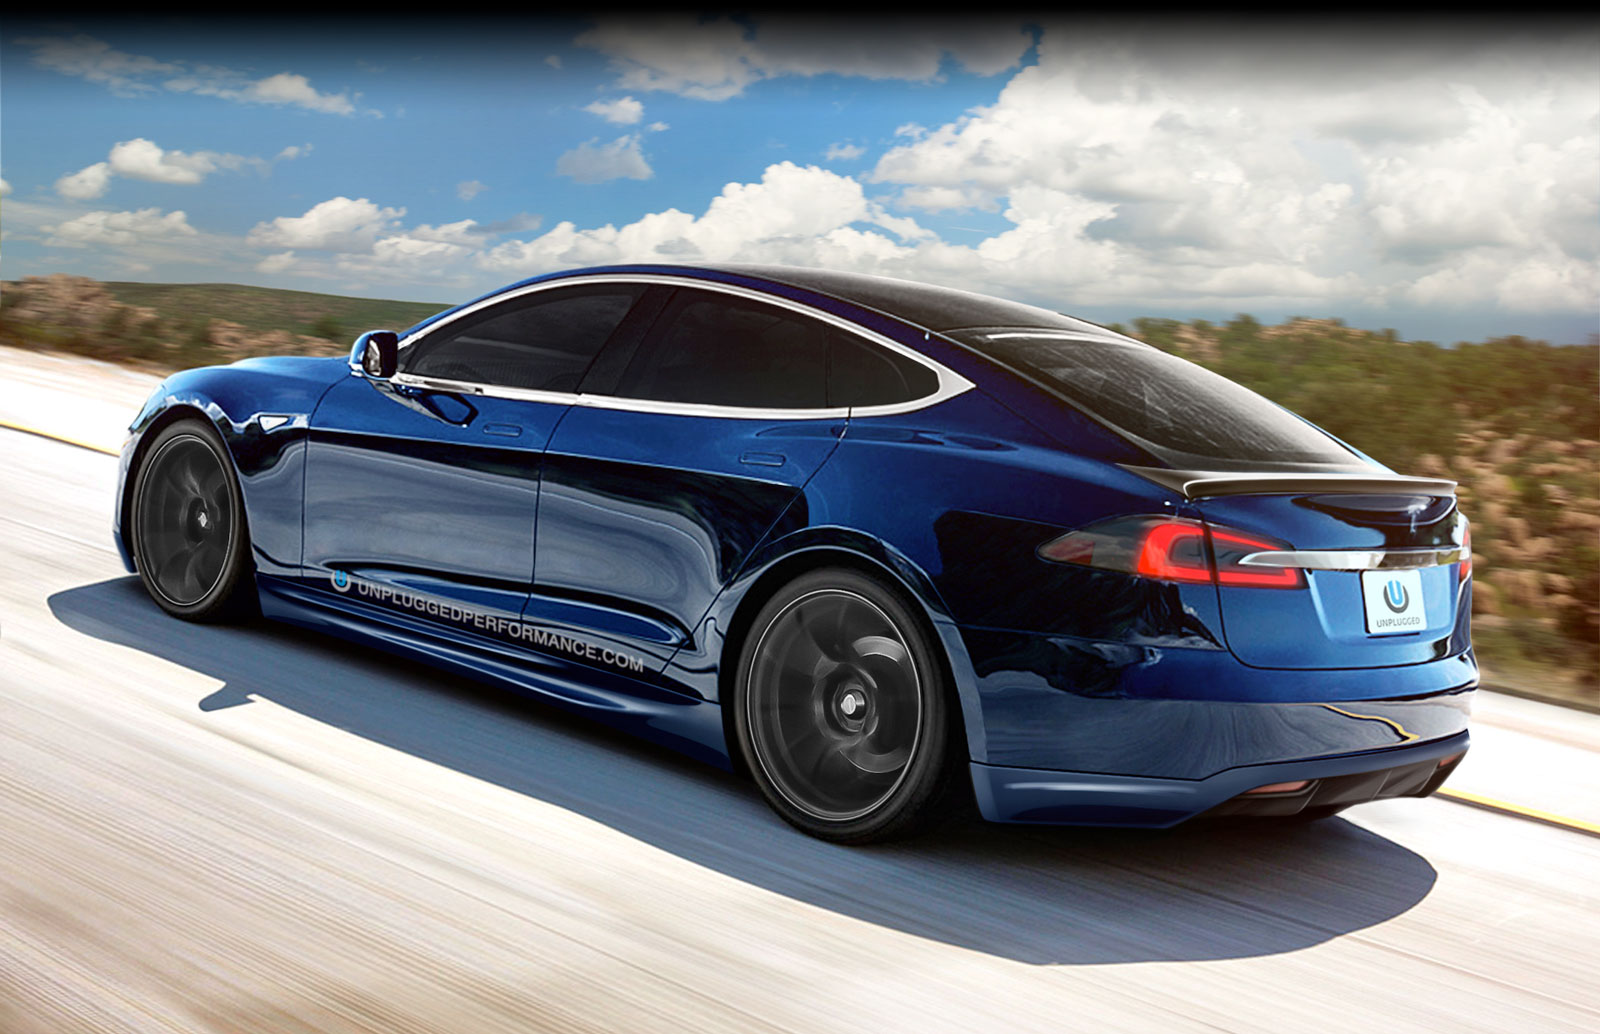 Unplugged Performance Tastefully Makes Your Tesla Model S